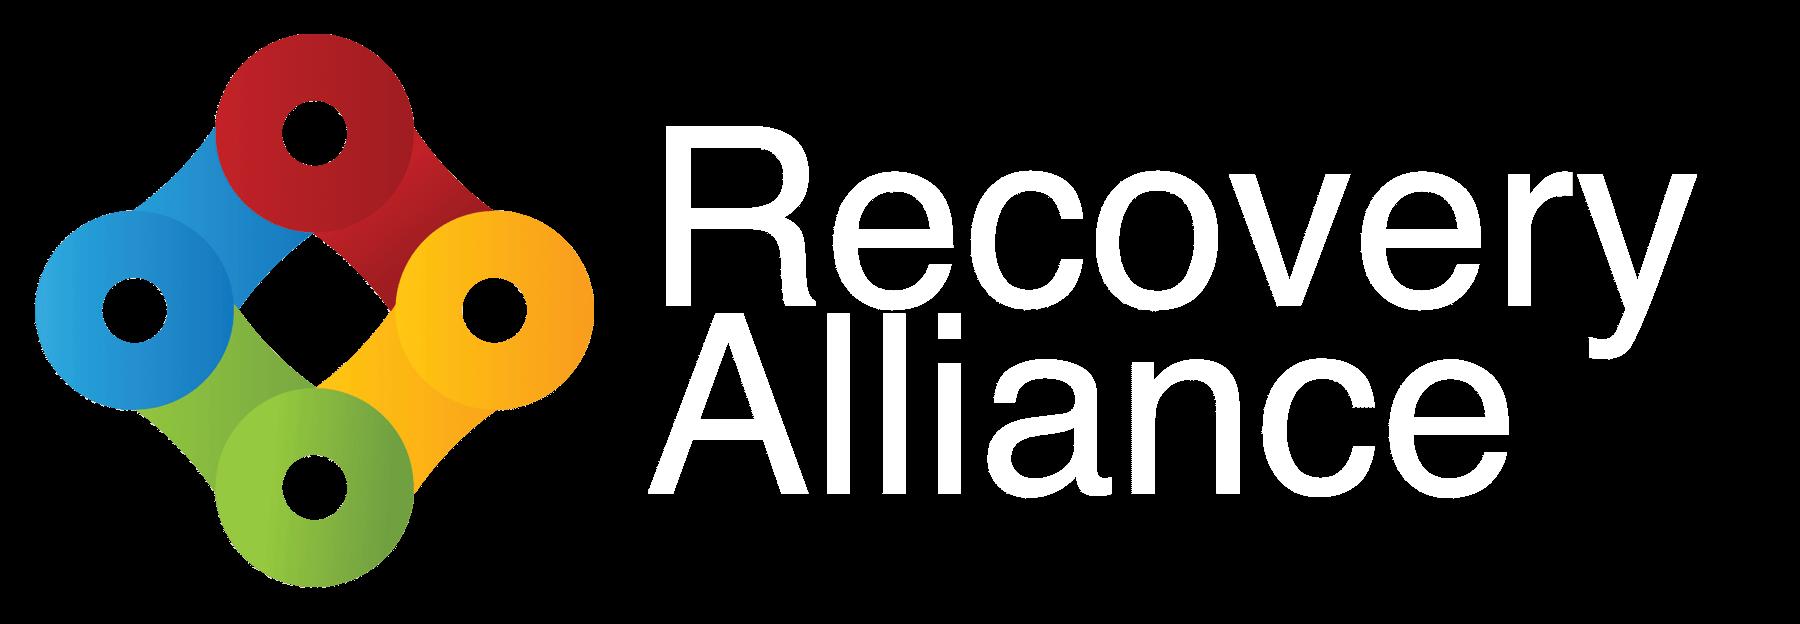 RecoveryAllianceInitiative-logo - white